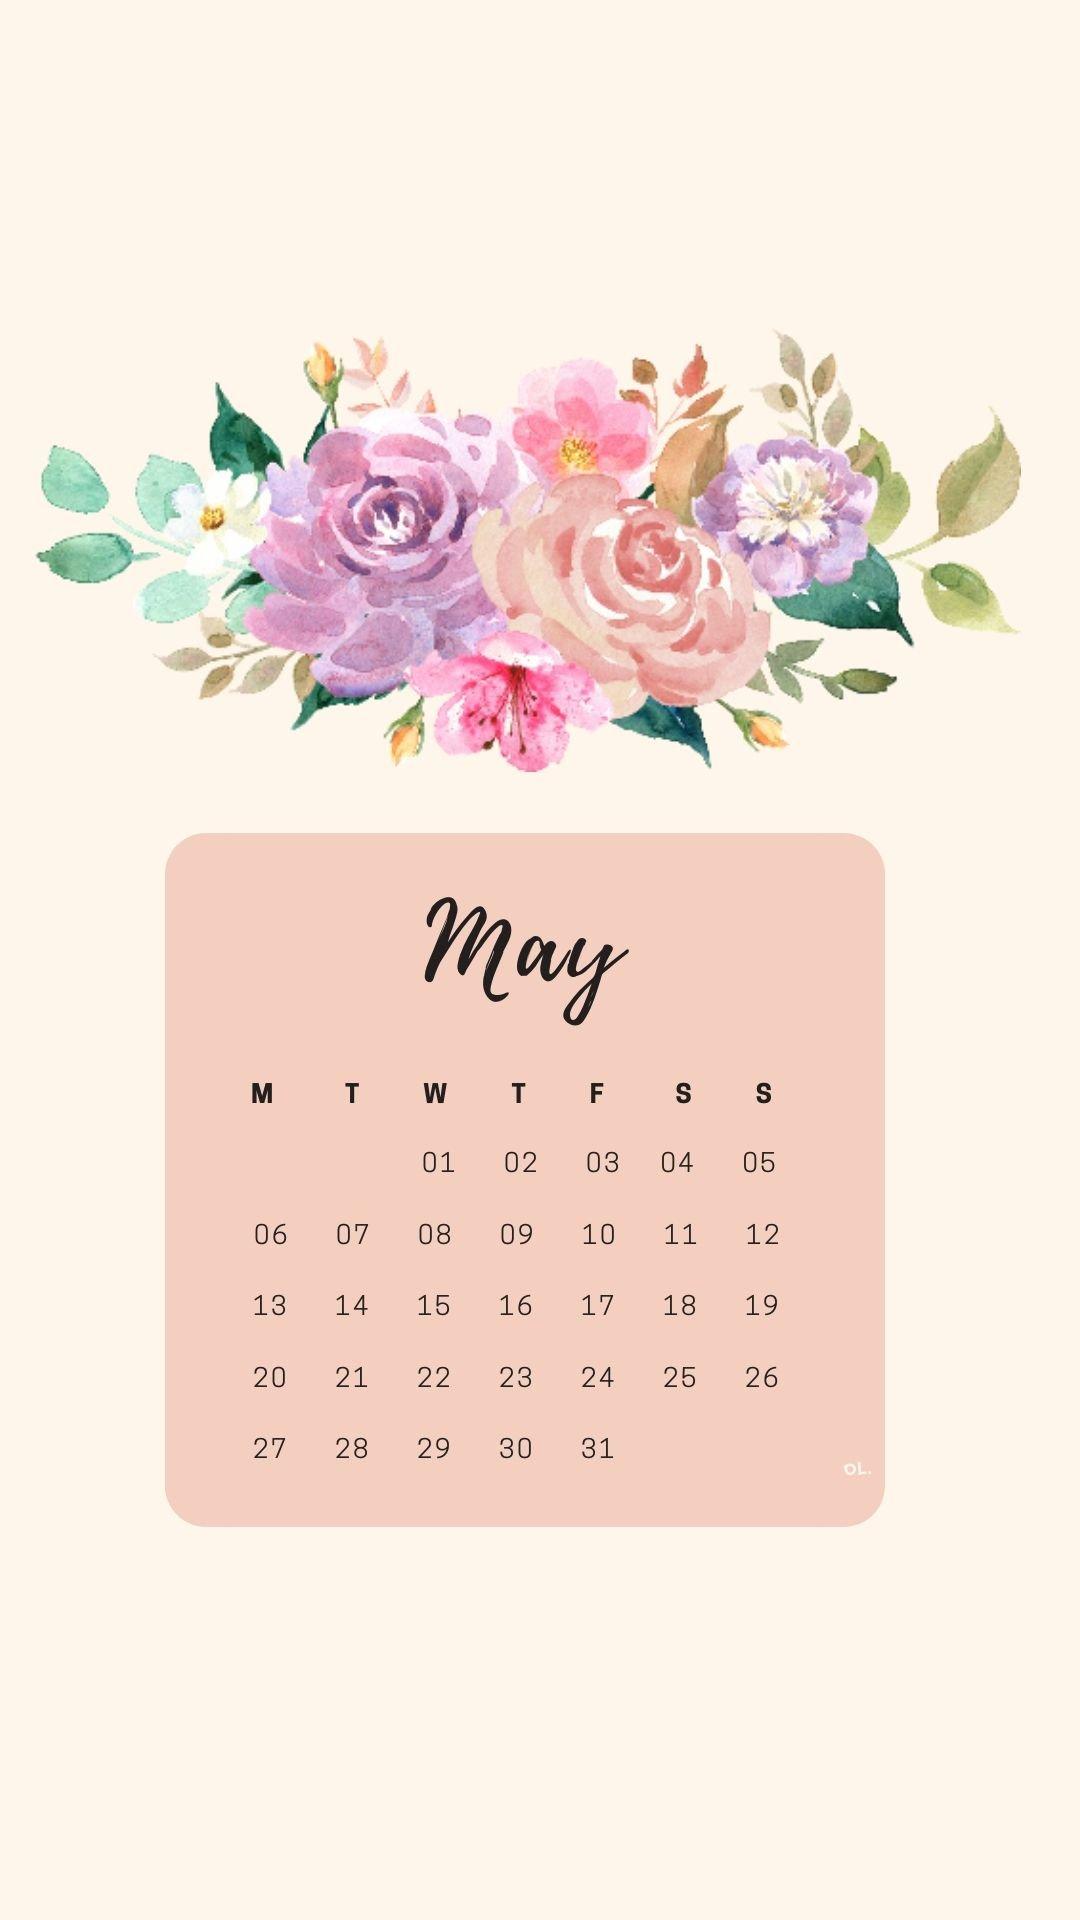 May 2019 Calendar Ipad Wallpaper #may2019 #may2019Calendarwallpaper Calendar 2019 Video